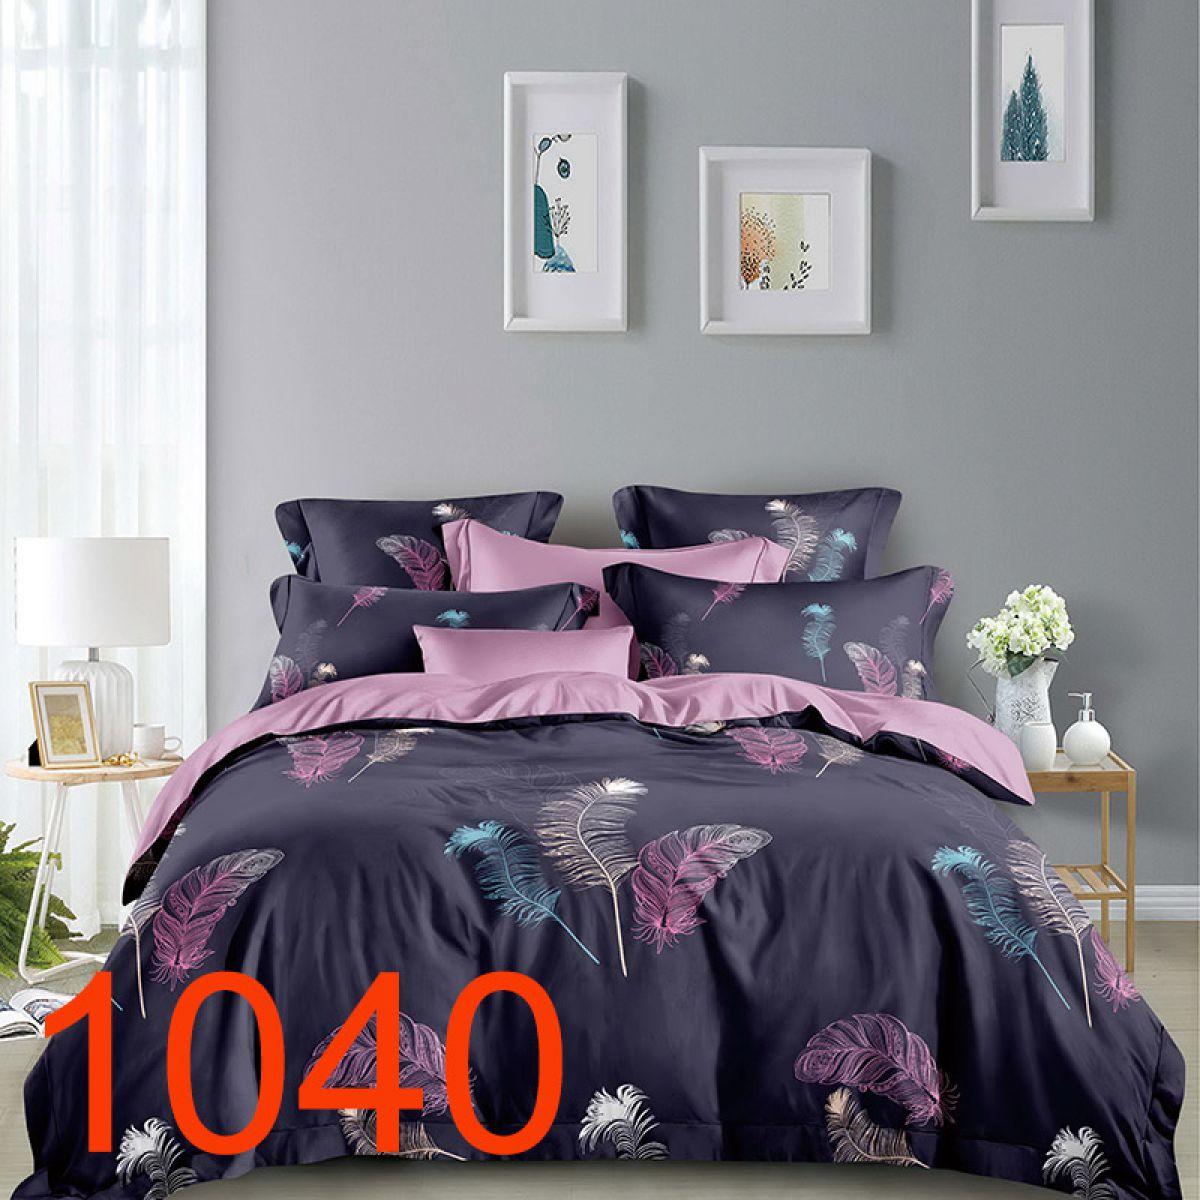 Double-sided Beddings - FBC-8054 - 220x200 cm - 3 pcs